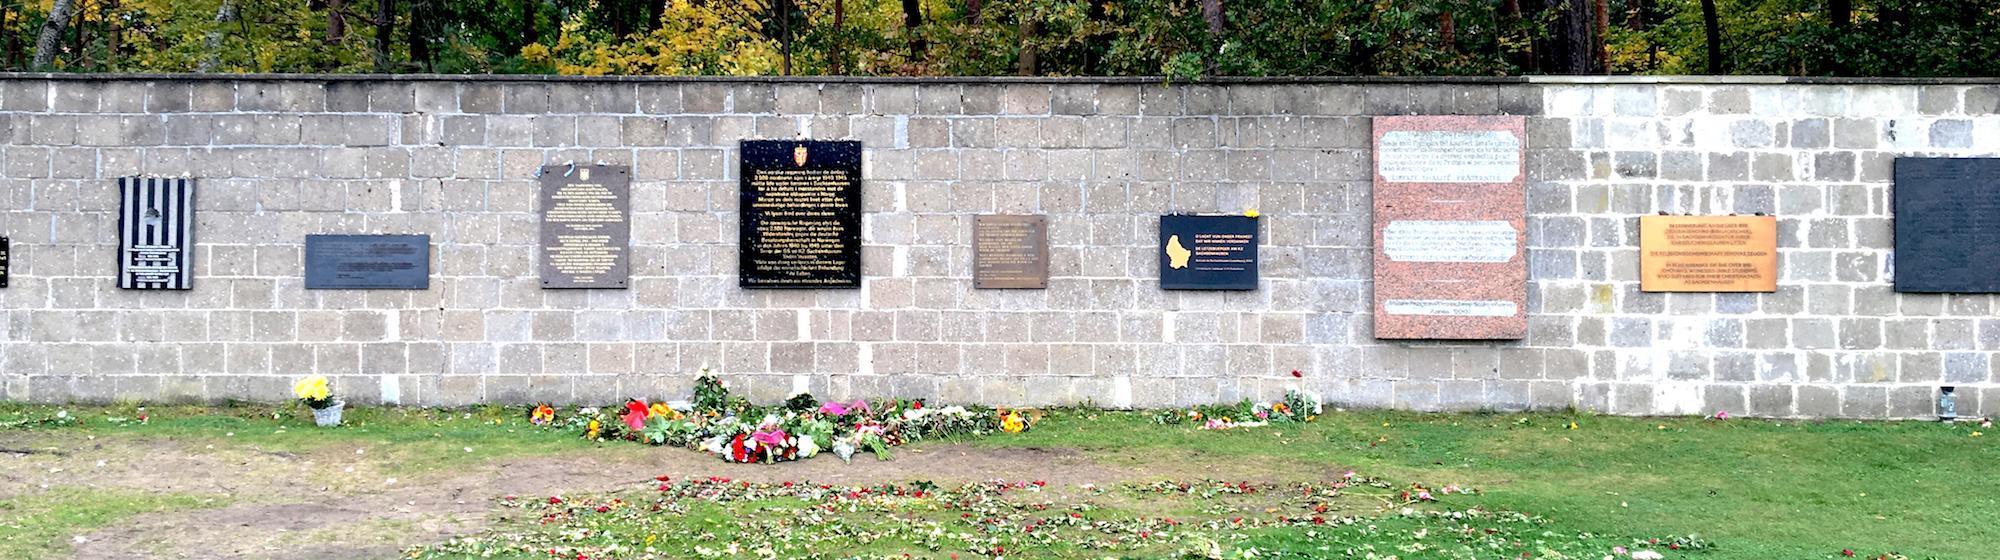 Sachsenhausen concentration camp: memorial wall